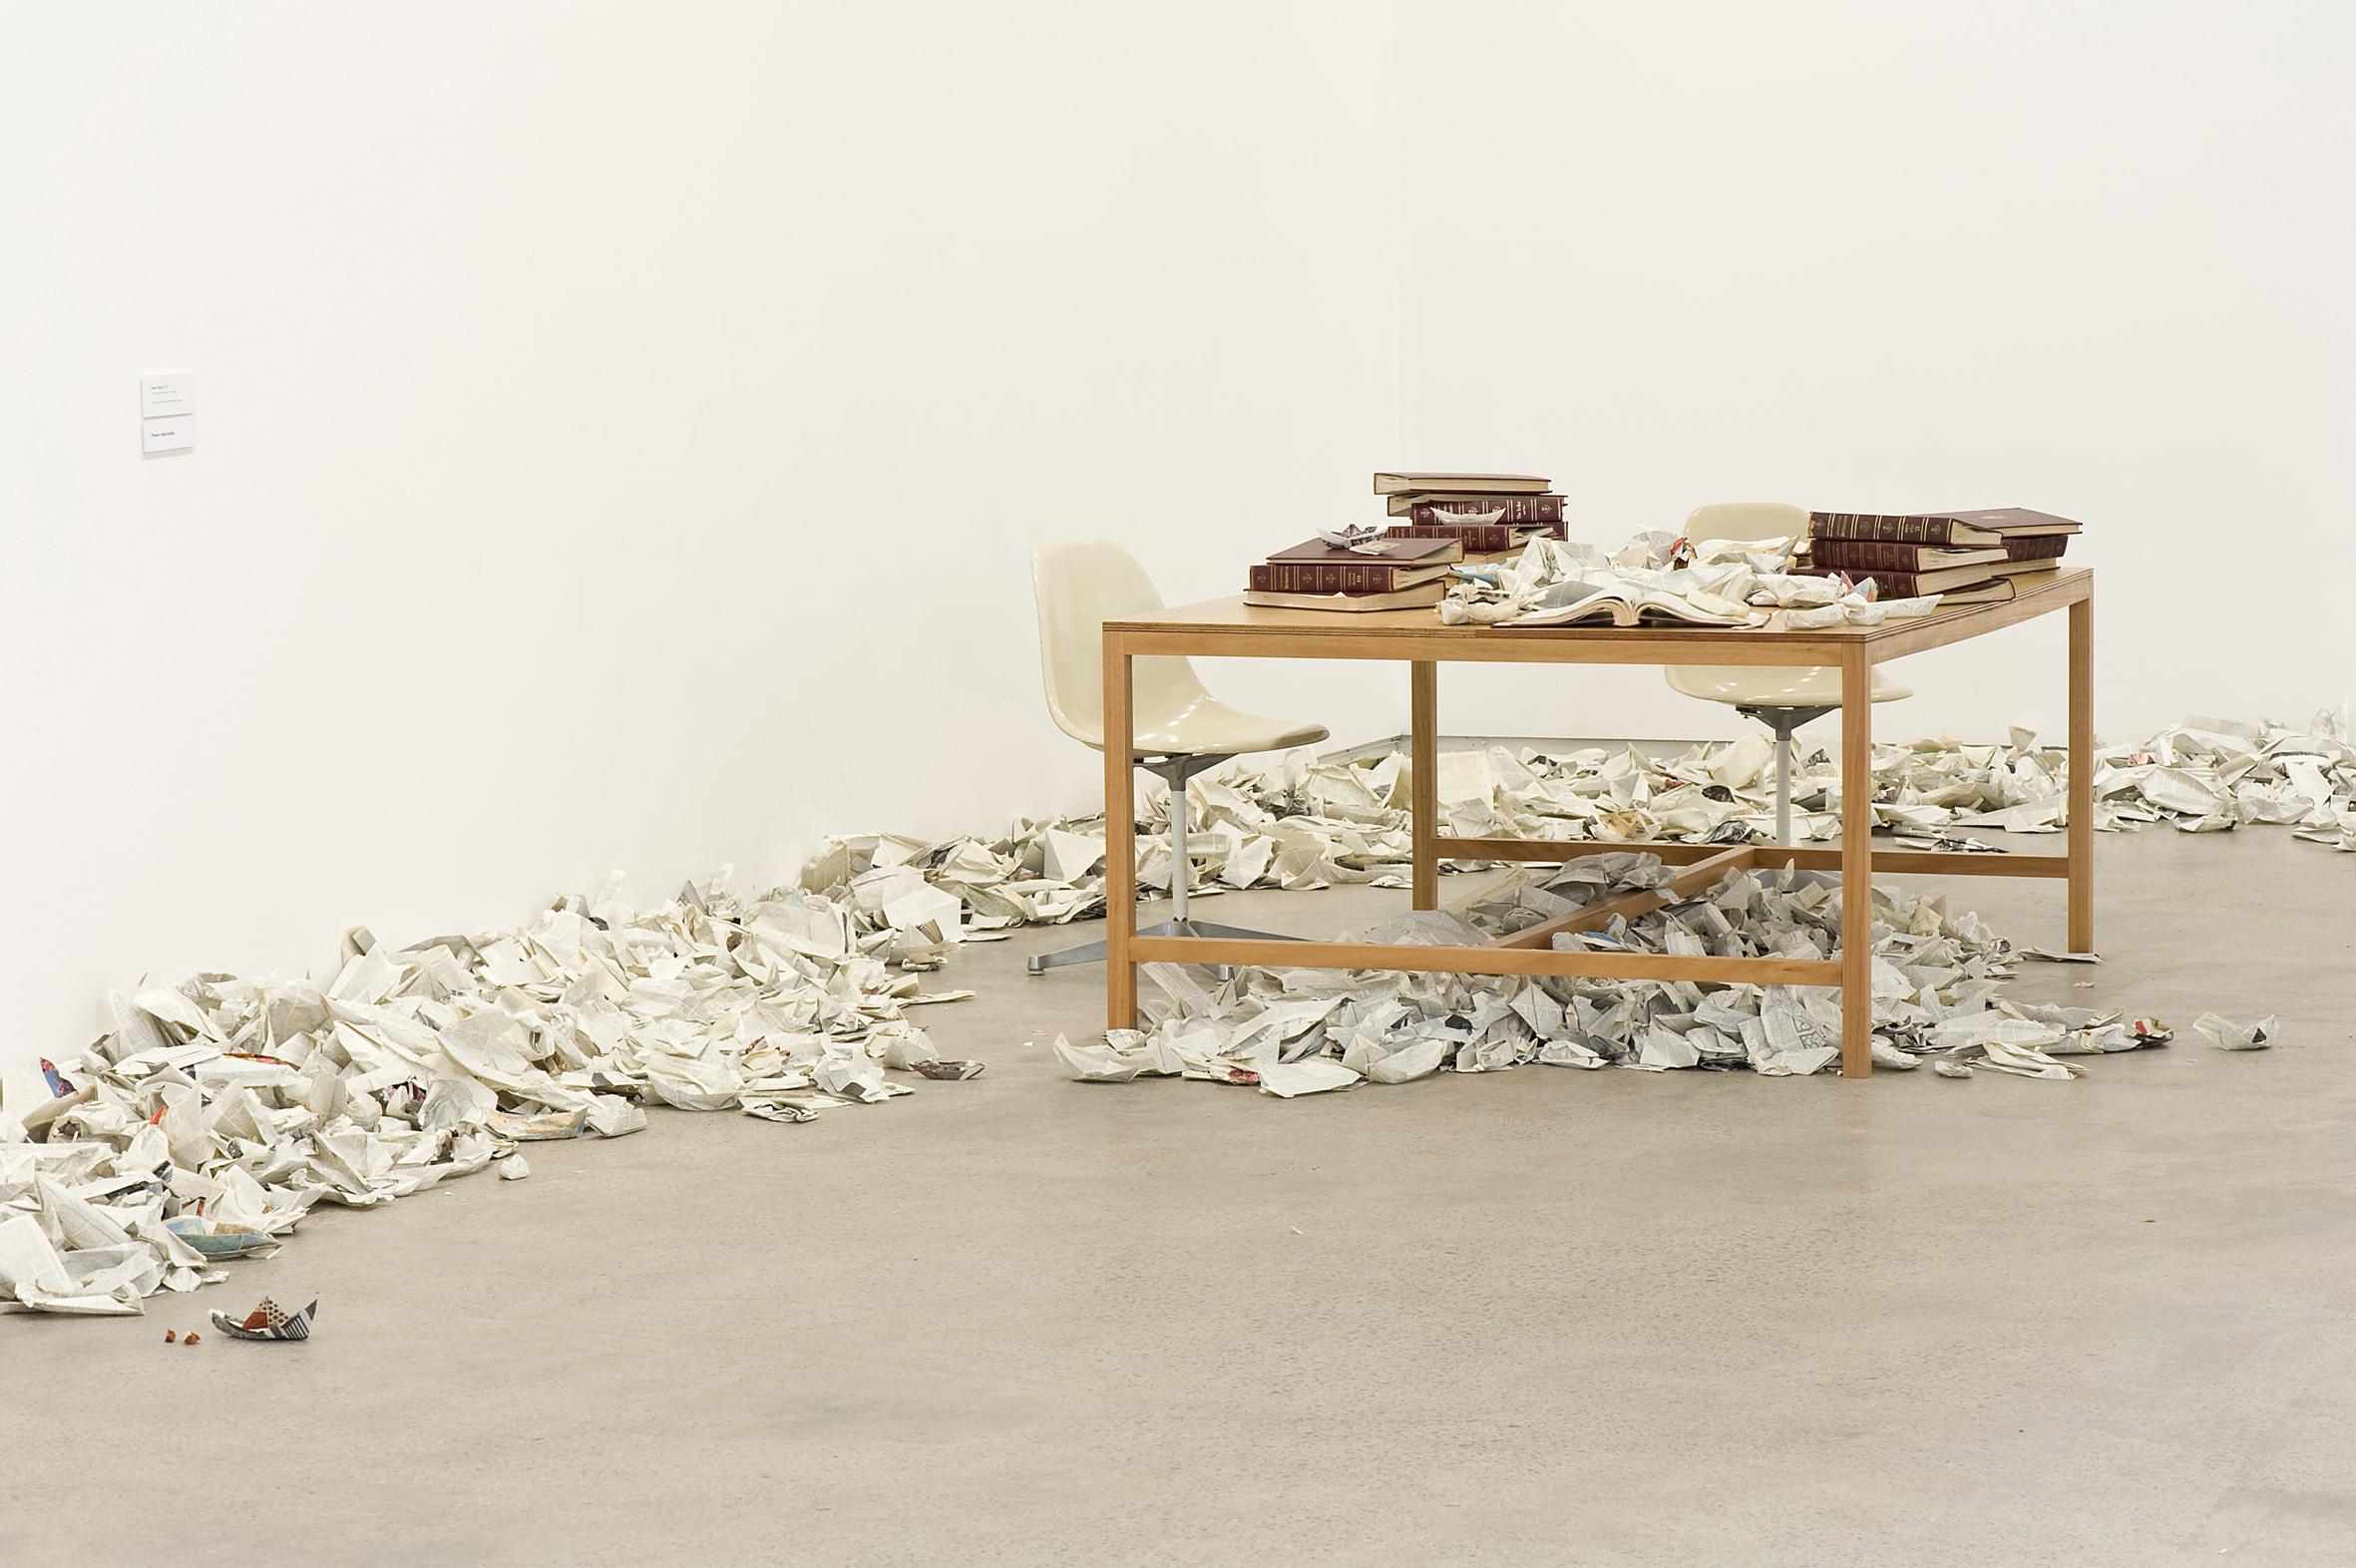 Simryn Gill (1959, Singapore) Paper Boats, 2008